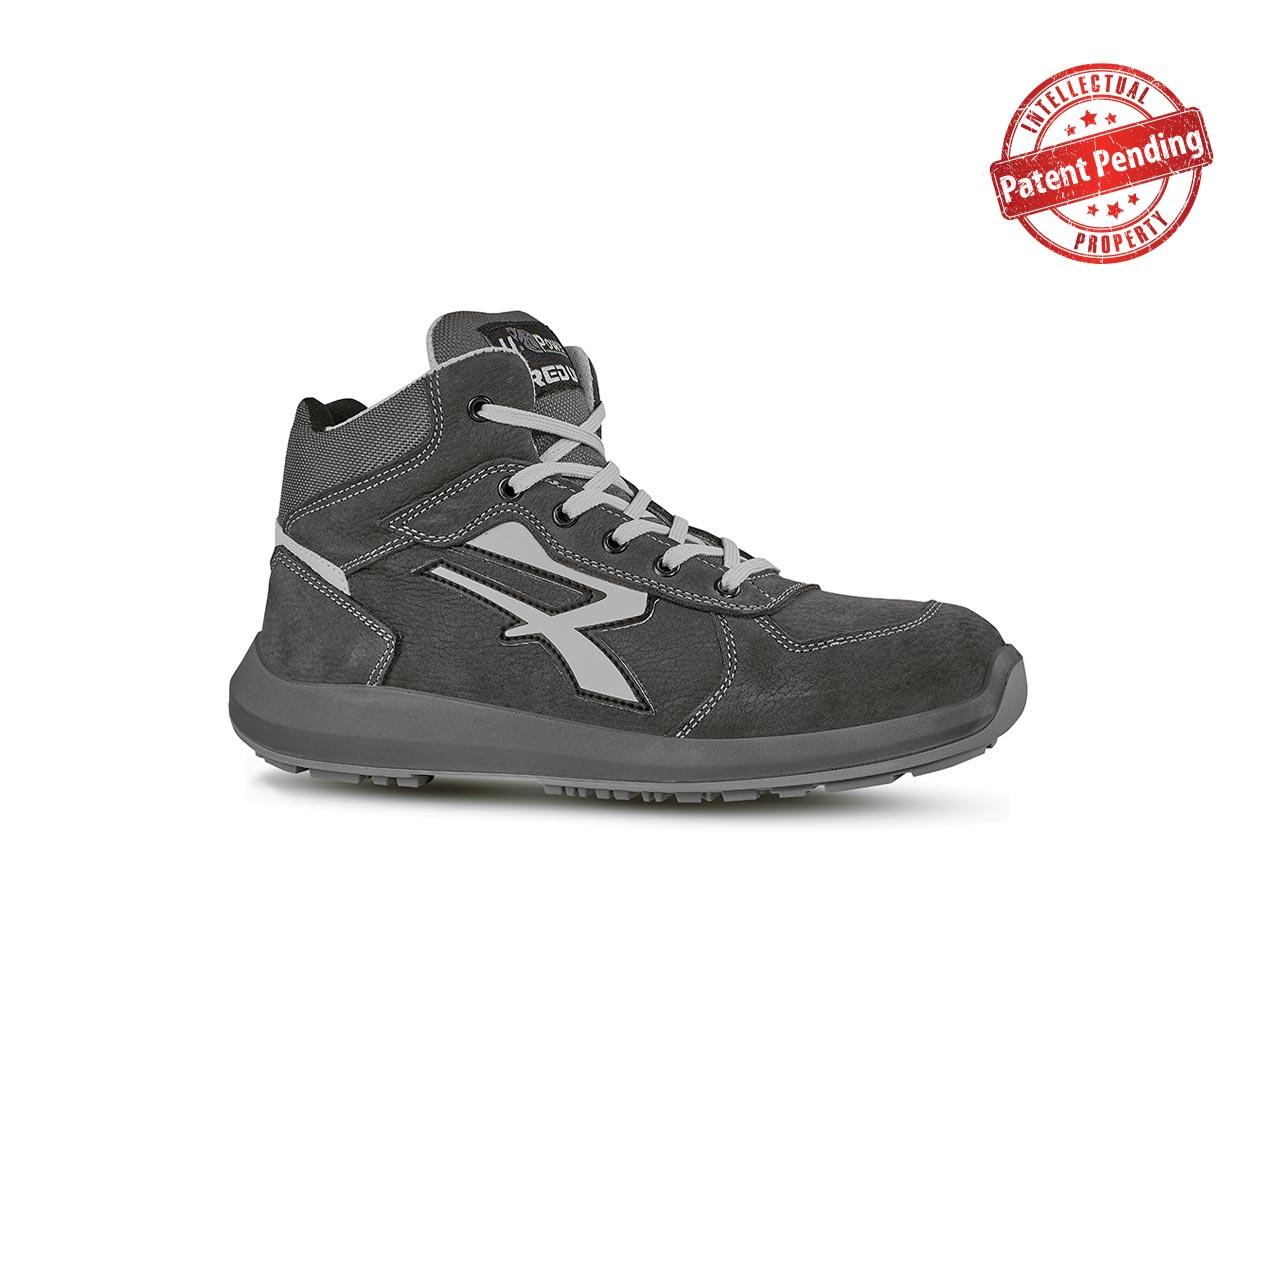 scarpa antinfortunistica alta upower modello merak linea redup vista laterale